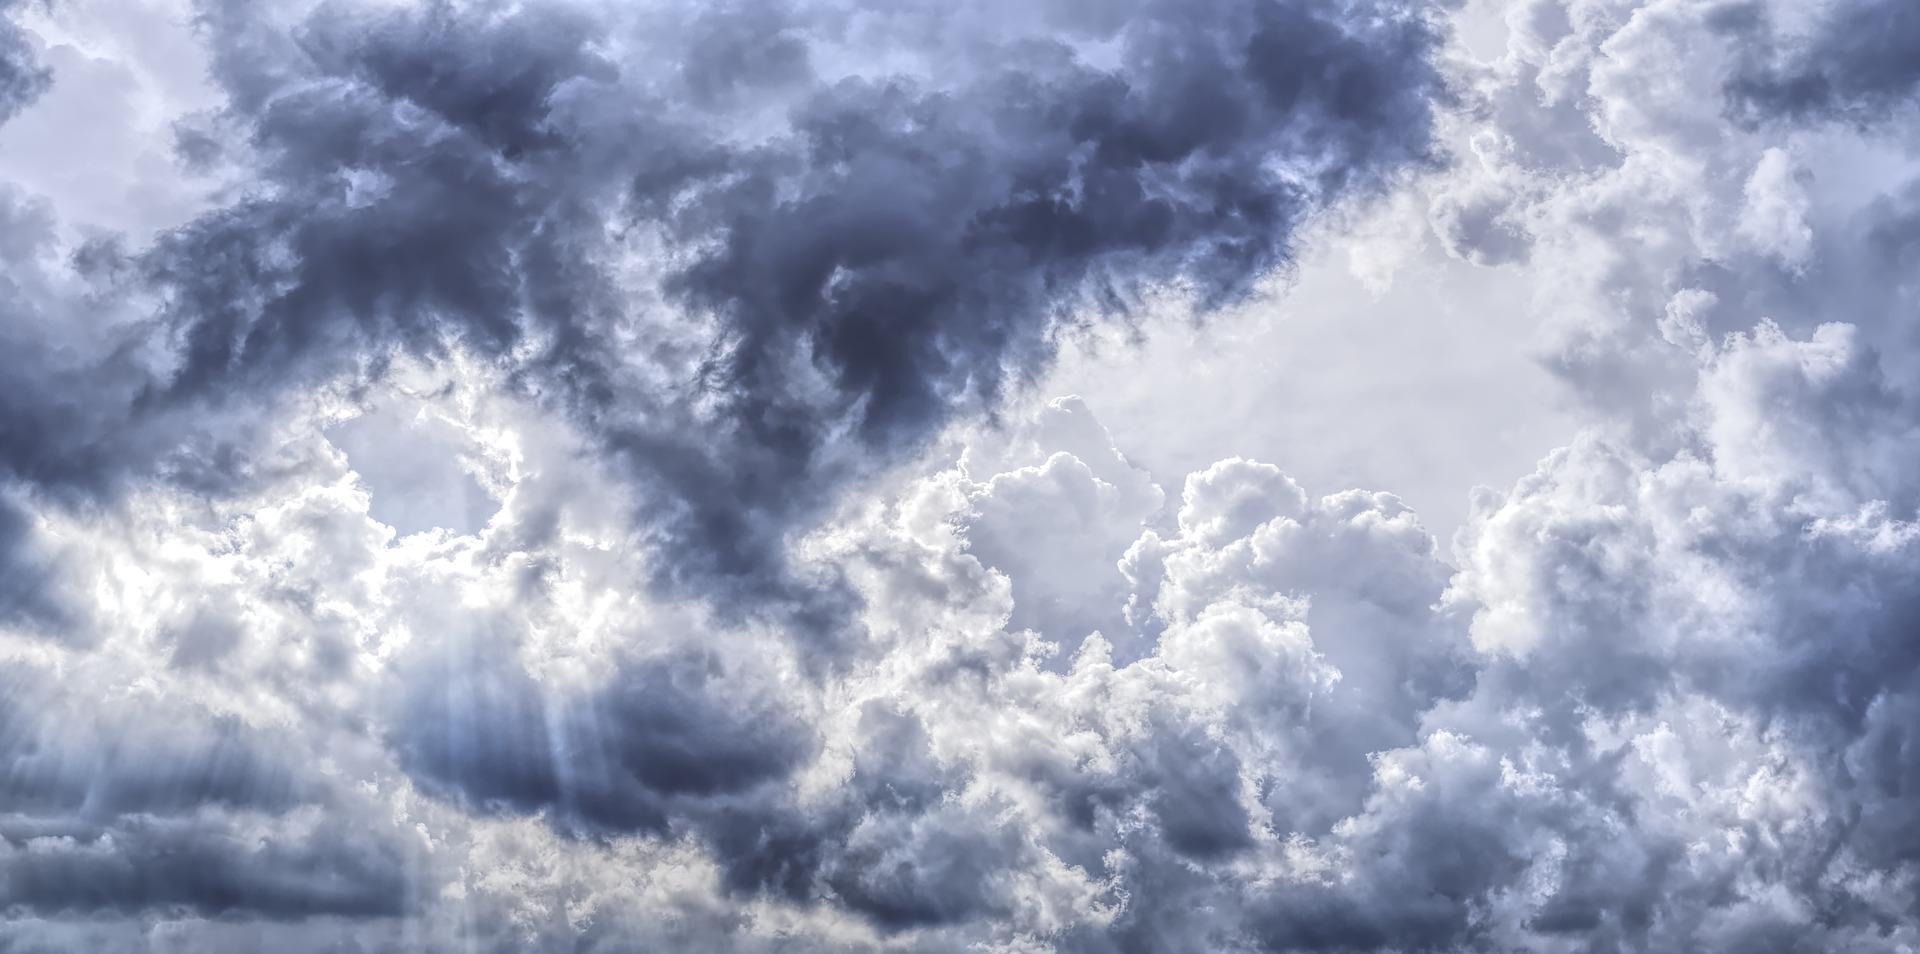 Consulenze variabili e parzialmente nuvolose